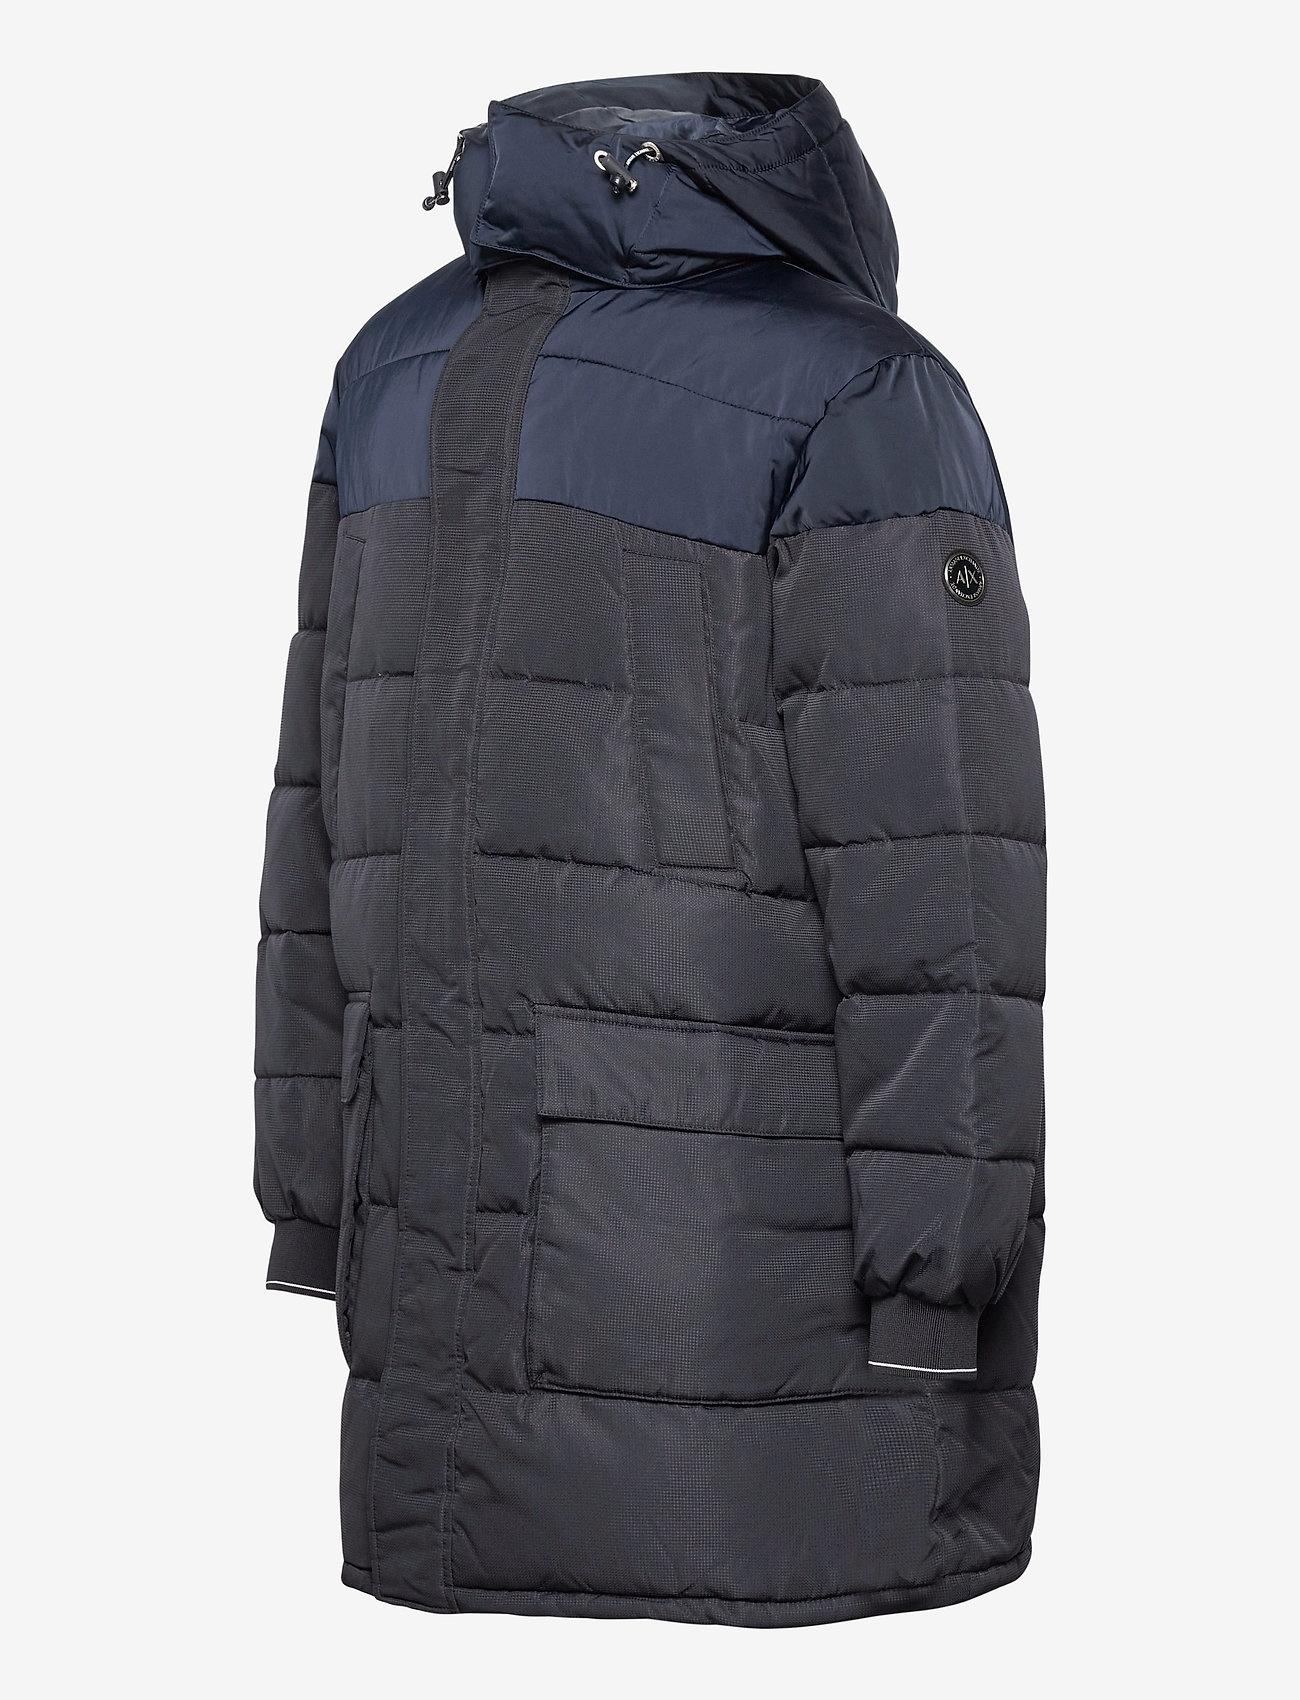 Armani Exchange Winterjas, blauw